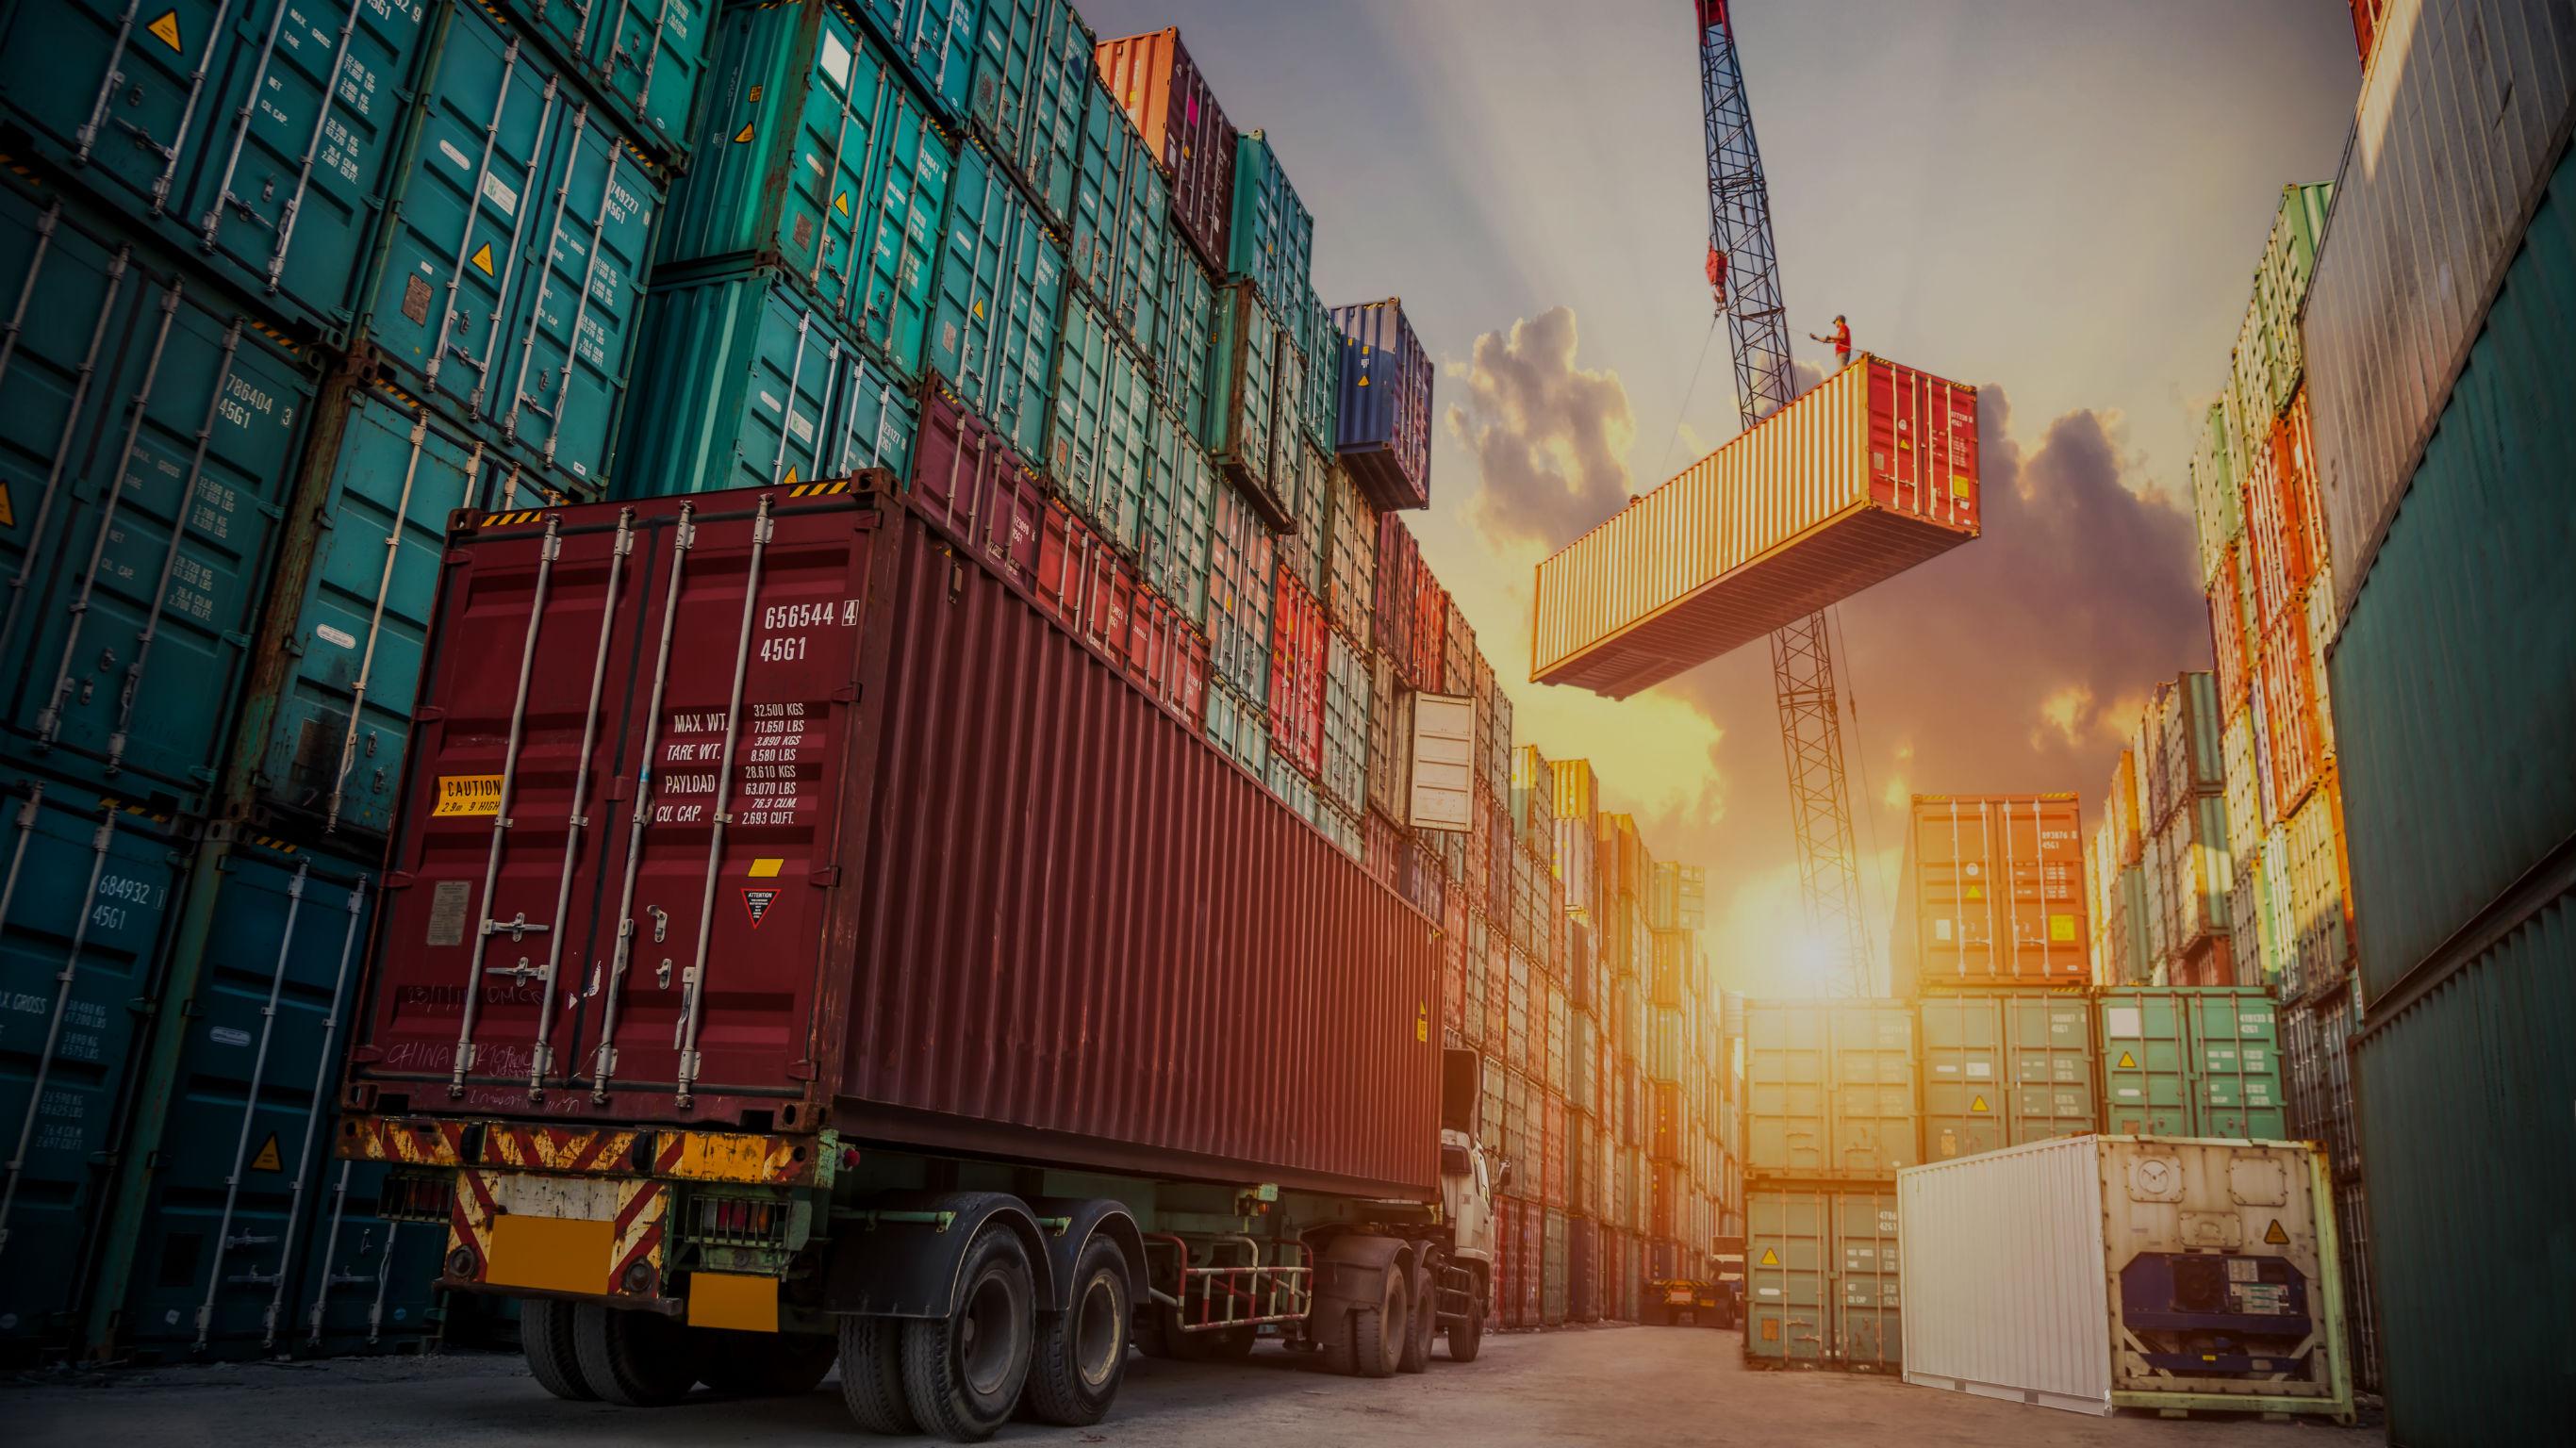 principles of transport and logistics management